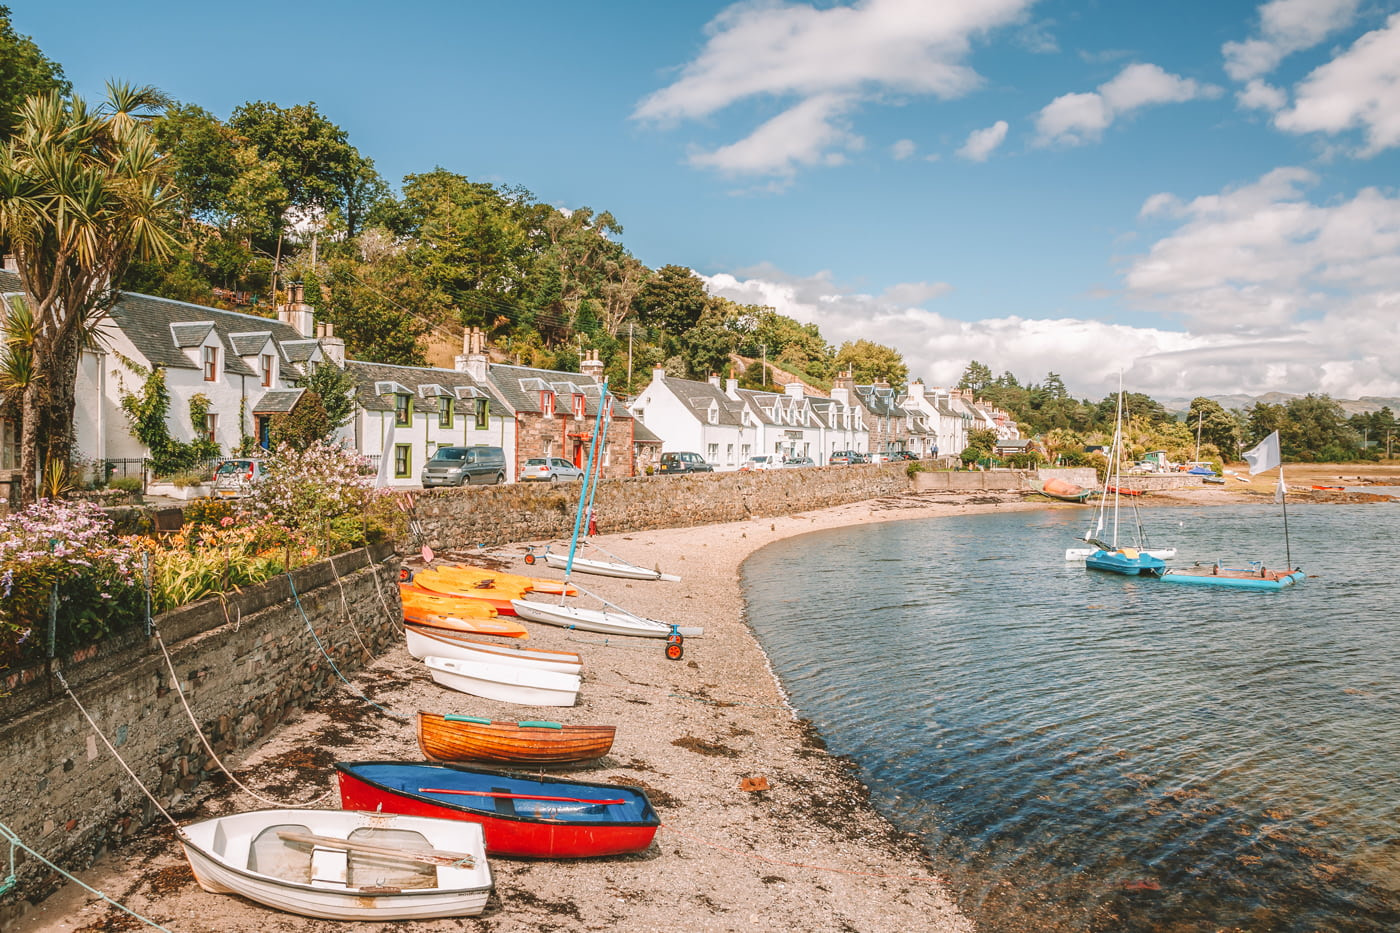 Most beautiful village in Scotland